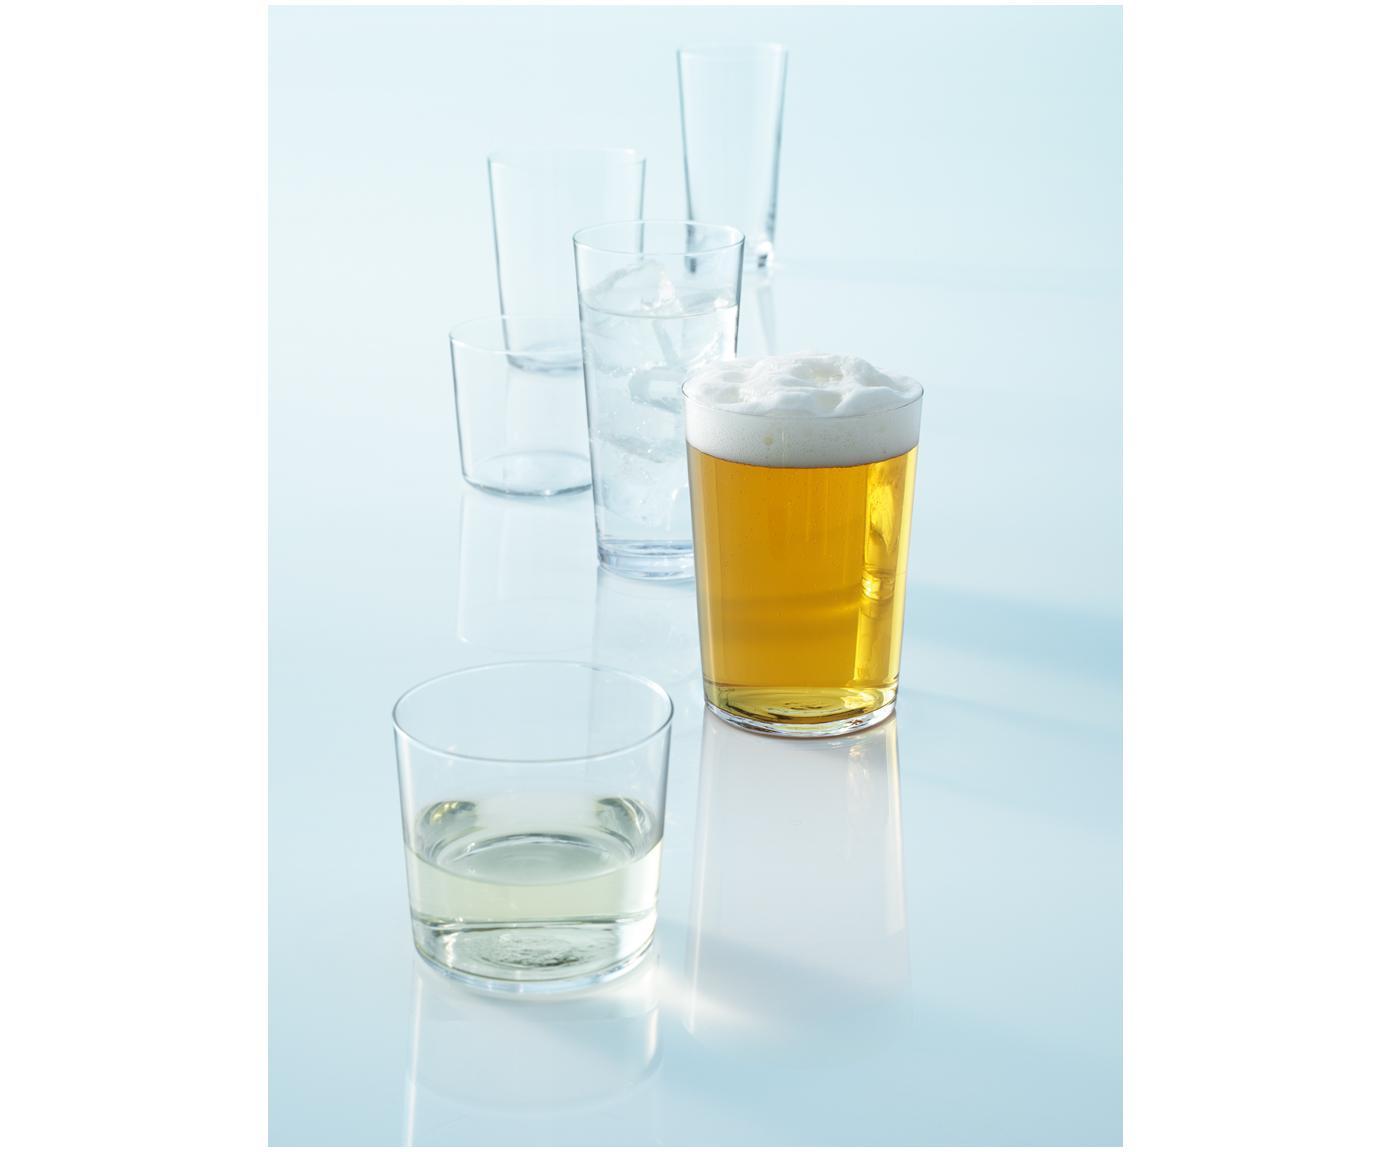 Bicchiere acqua in vetro sottile Gio 6 pz, Vetro, Trasparente, Ø 9 x Alt. 12 cm